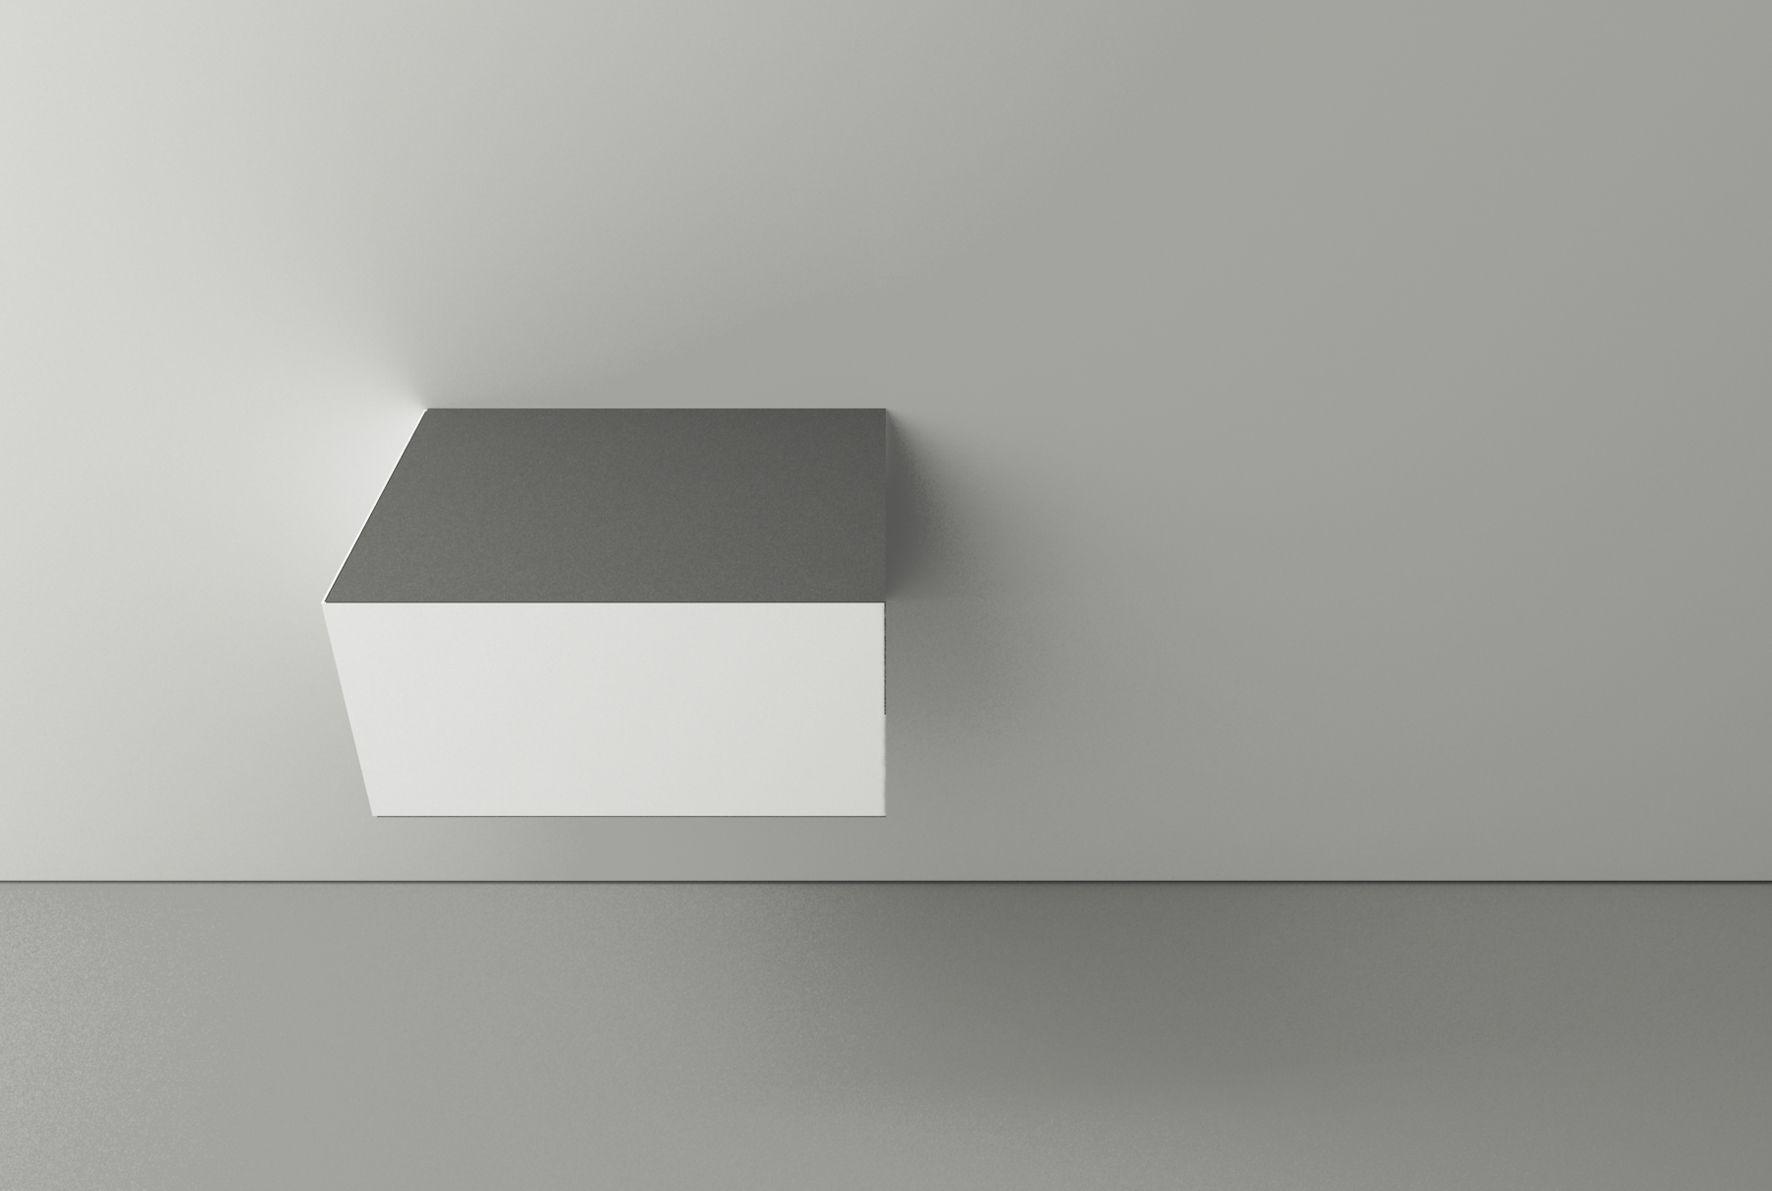 Due C Victor Vasilev Architect Bathrooms Pinterest Architects - Almost invisible minimalist kub bathroom sink by victor vasilev